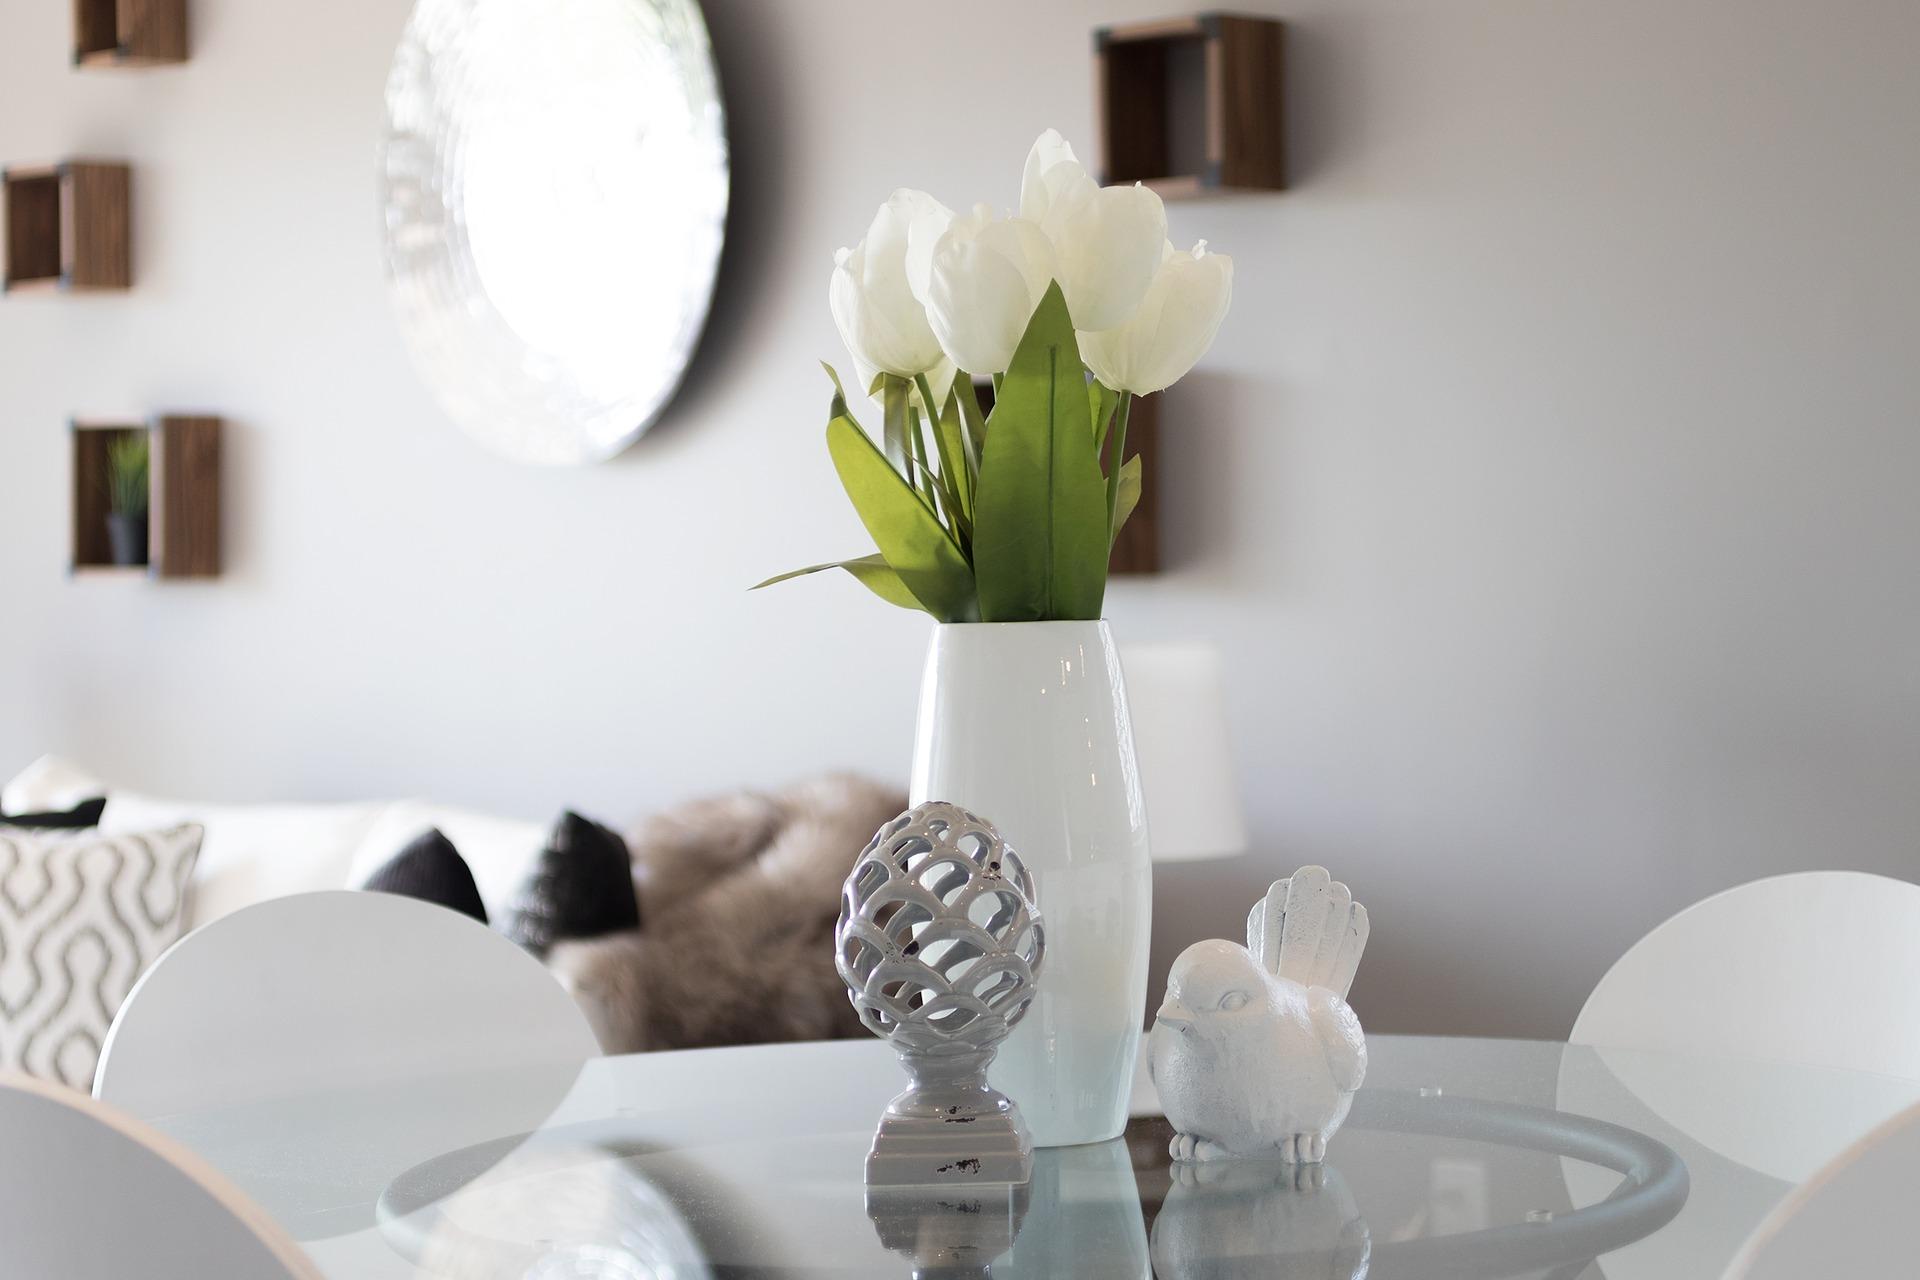 Home-Staging Immobilie verkaufen